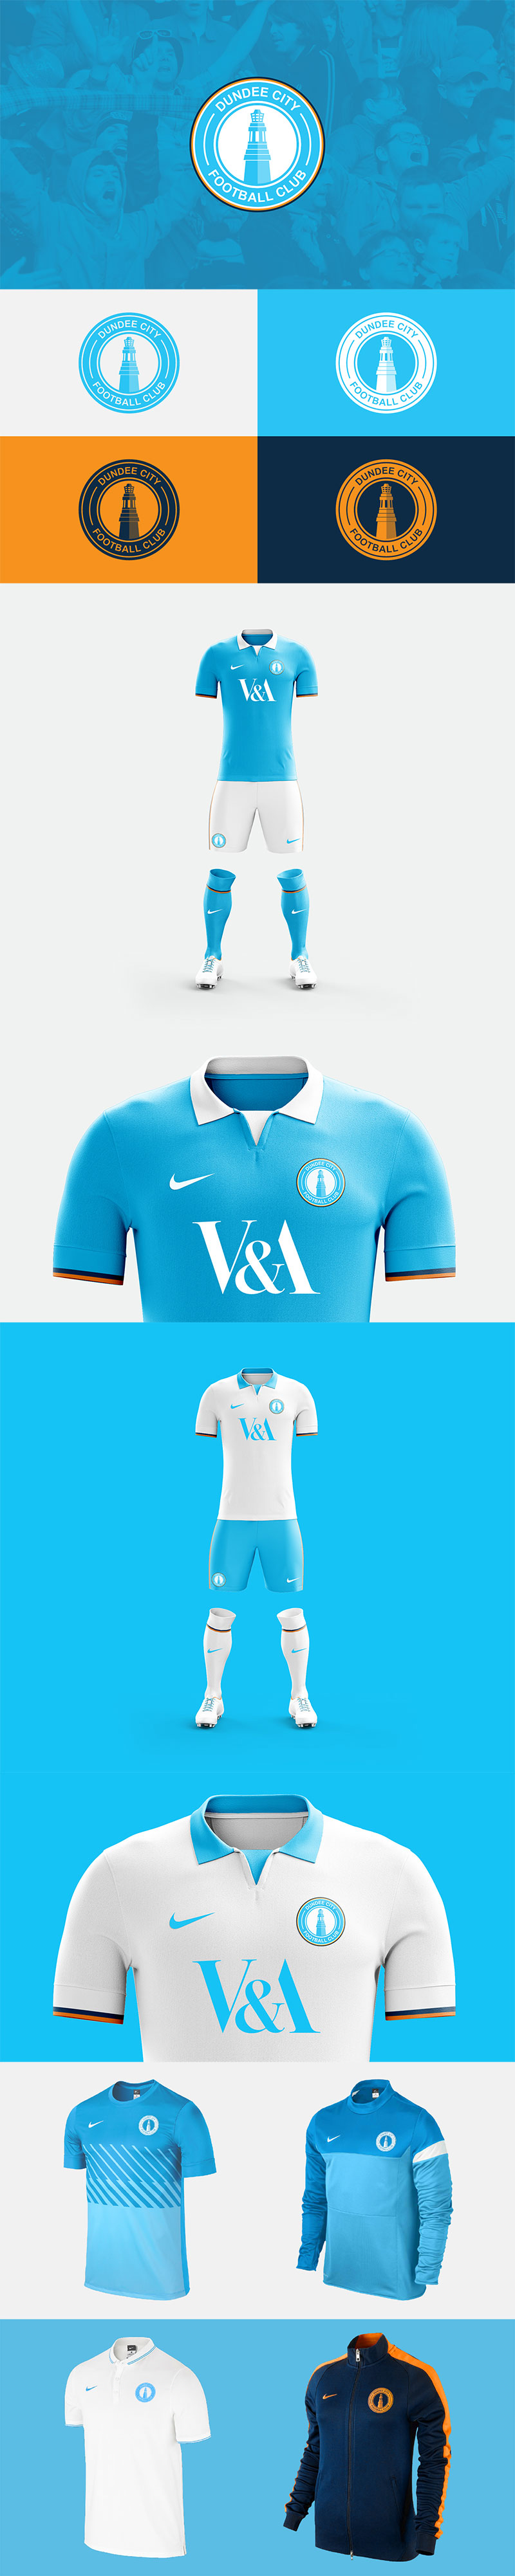 Diseños de la marca Football Club: Dundee City Football Club por Ryan McGinnis